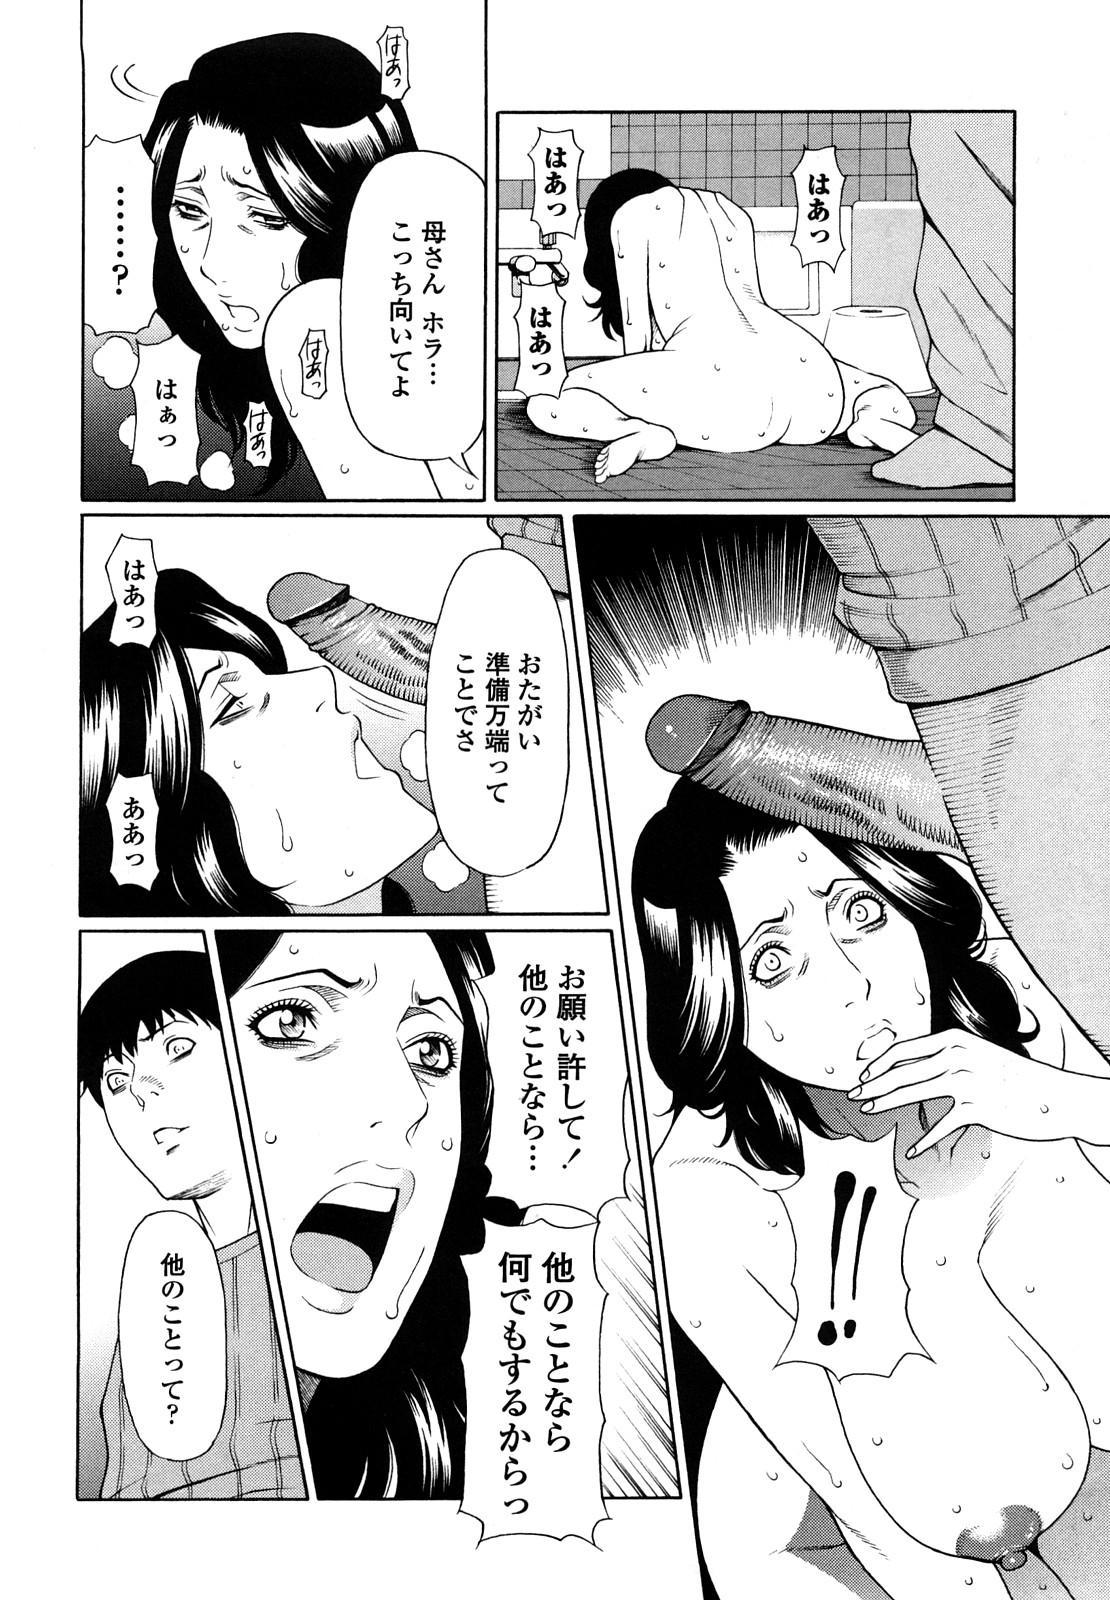 [Takasugi Kou] Kindan no Haha-Ana - Immorality Love-Hole [Decensored] 11